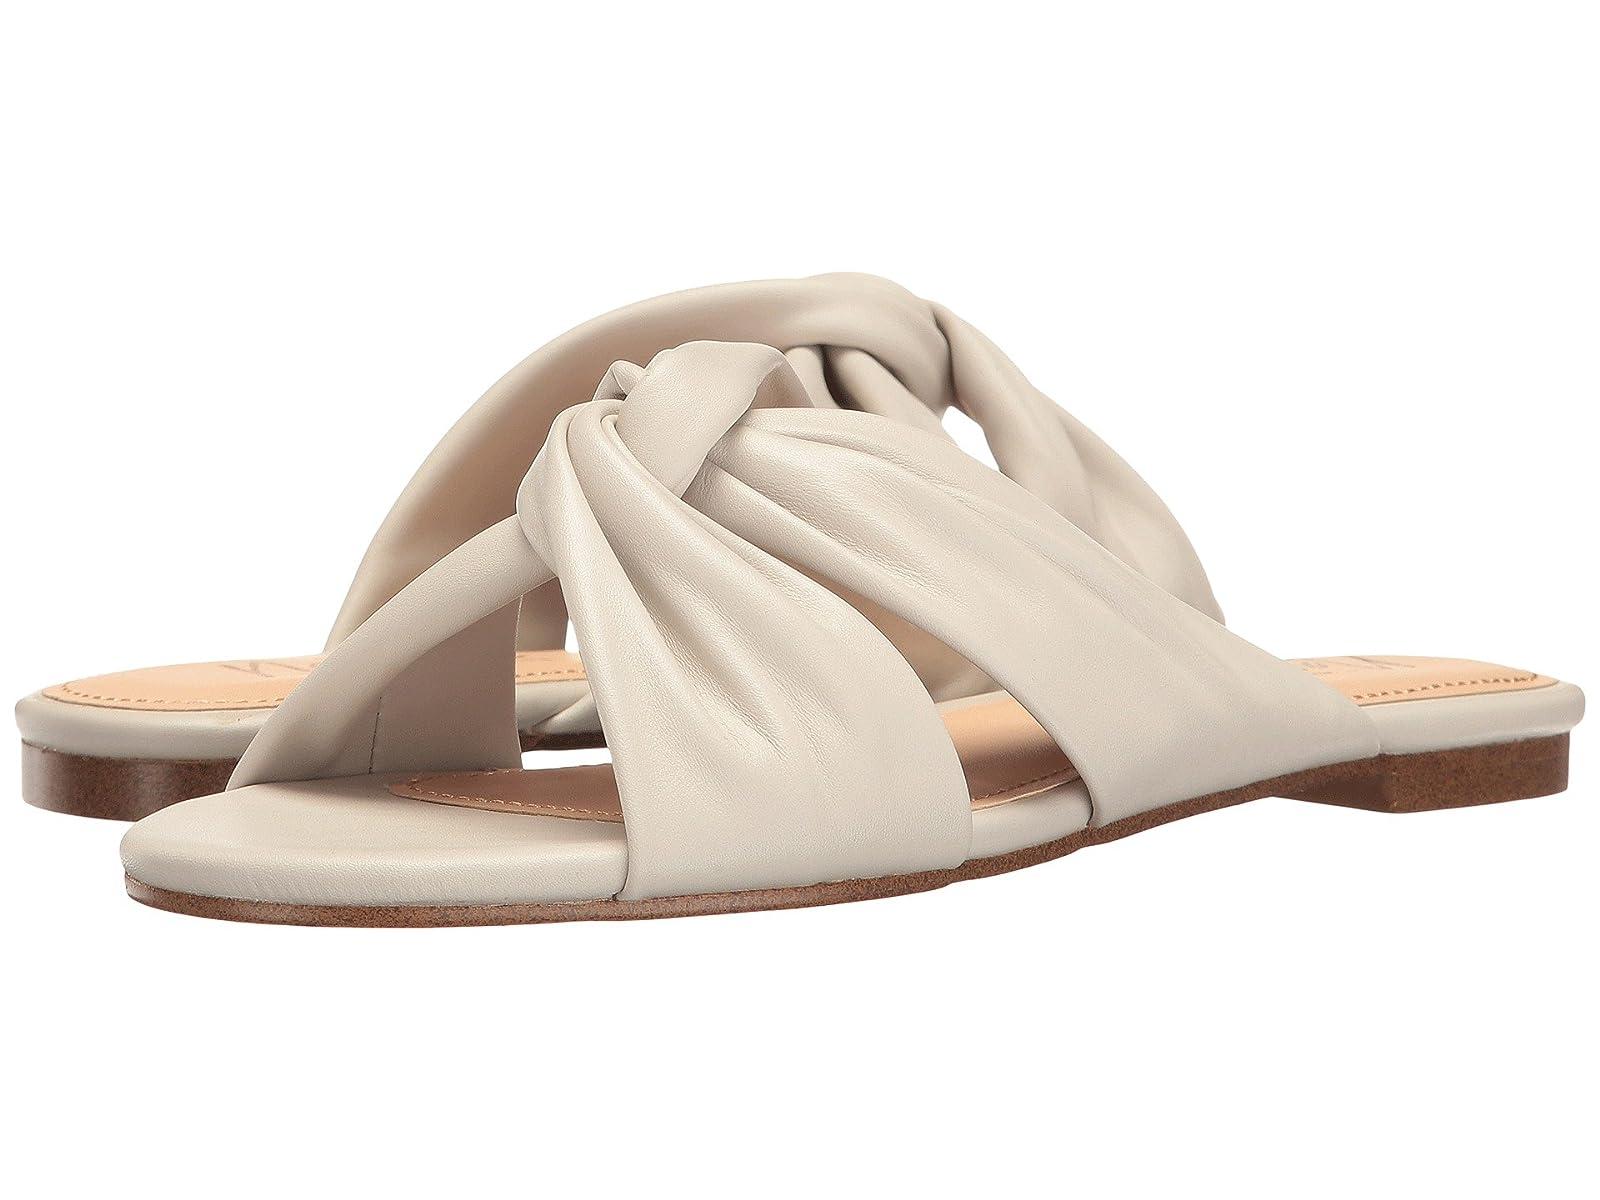 Nanette nanette lepore VandaCheap and distinctive eye-catching shoes